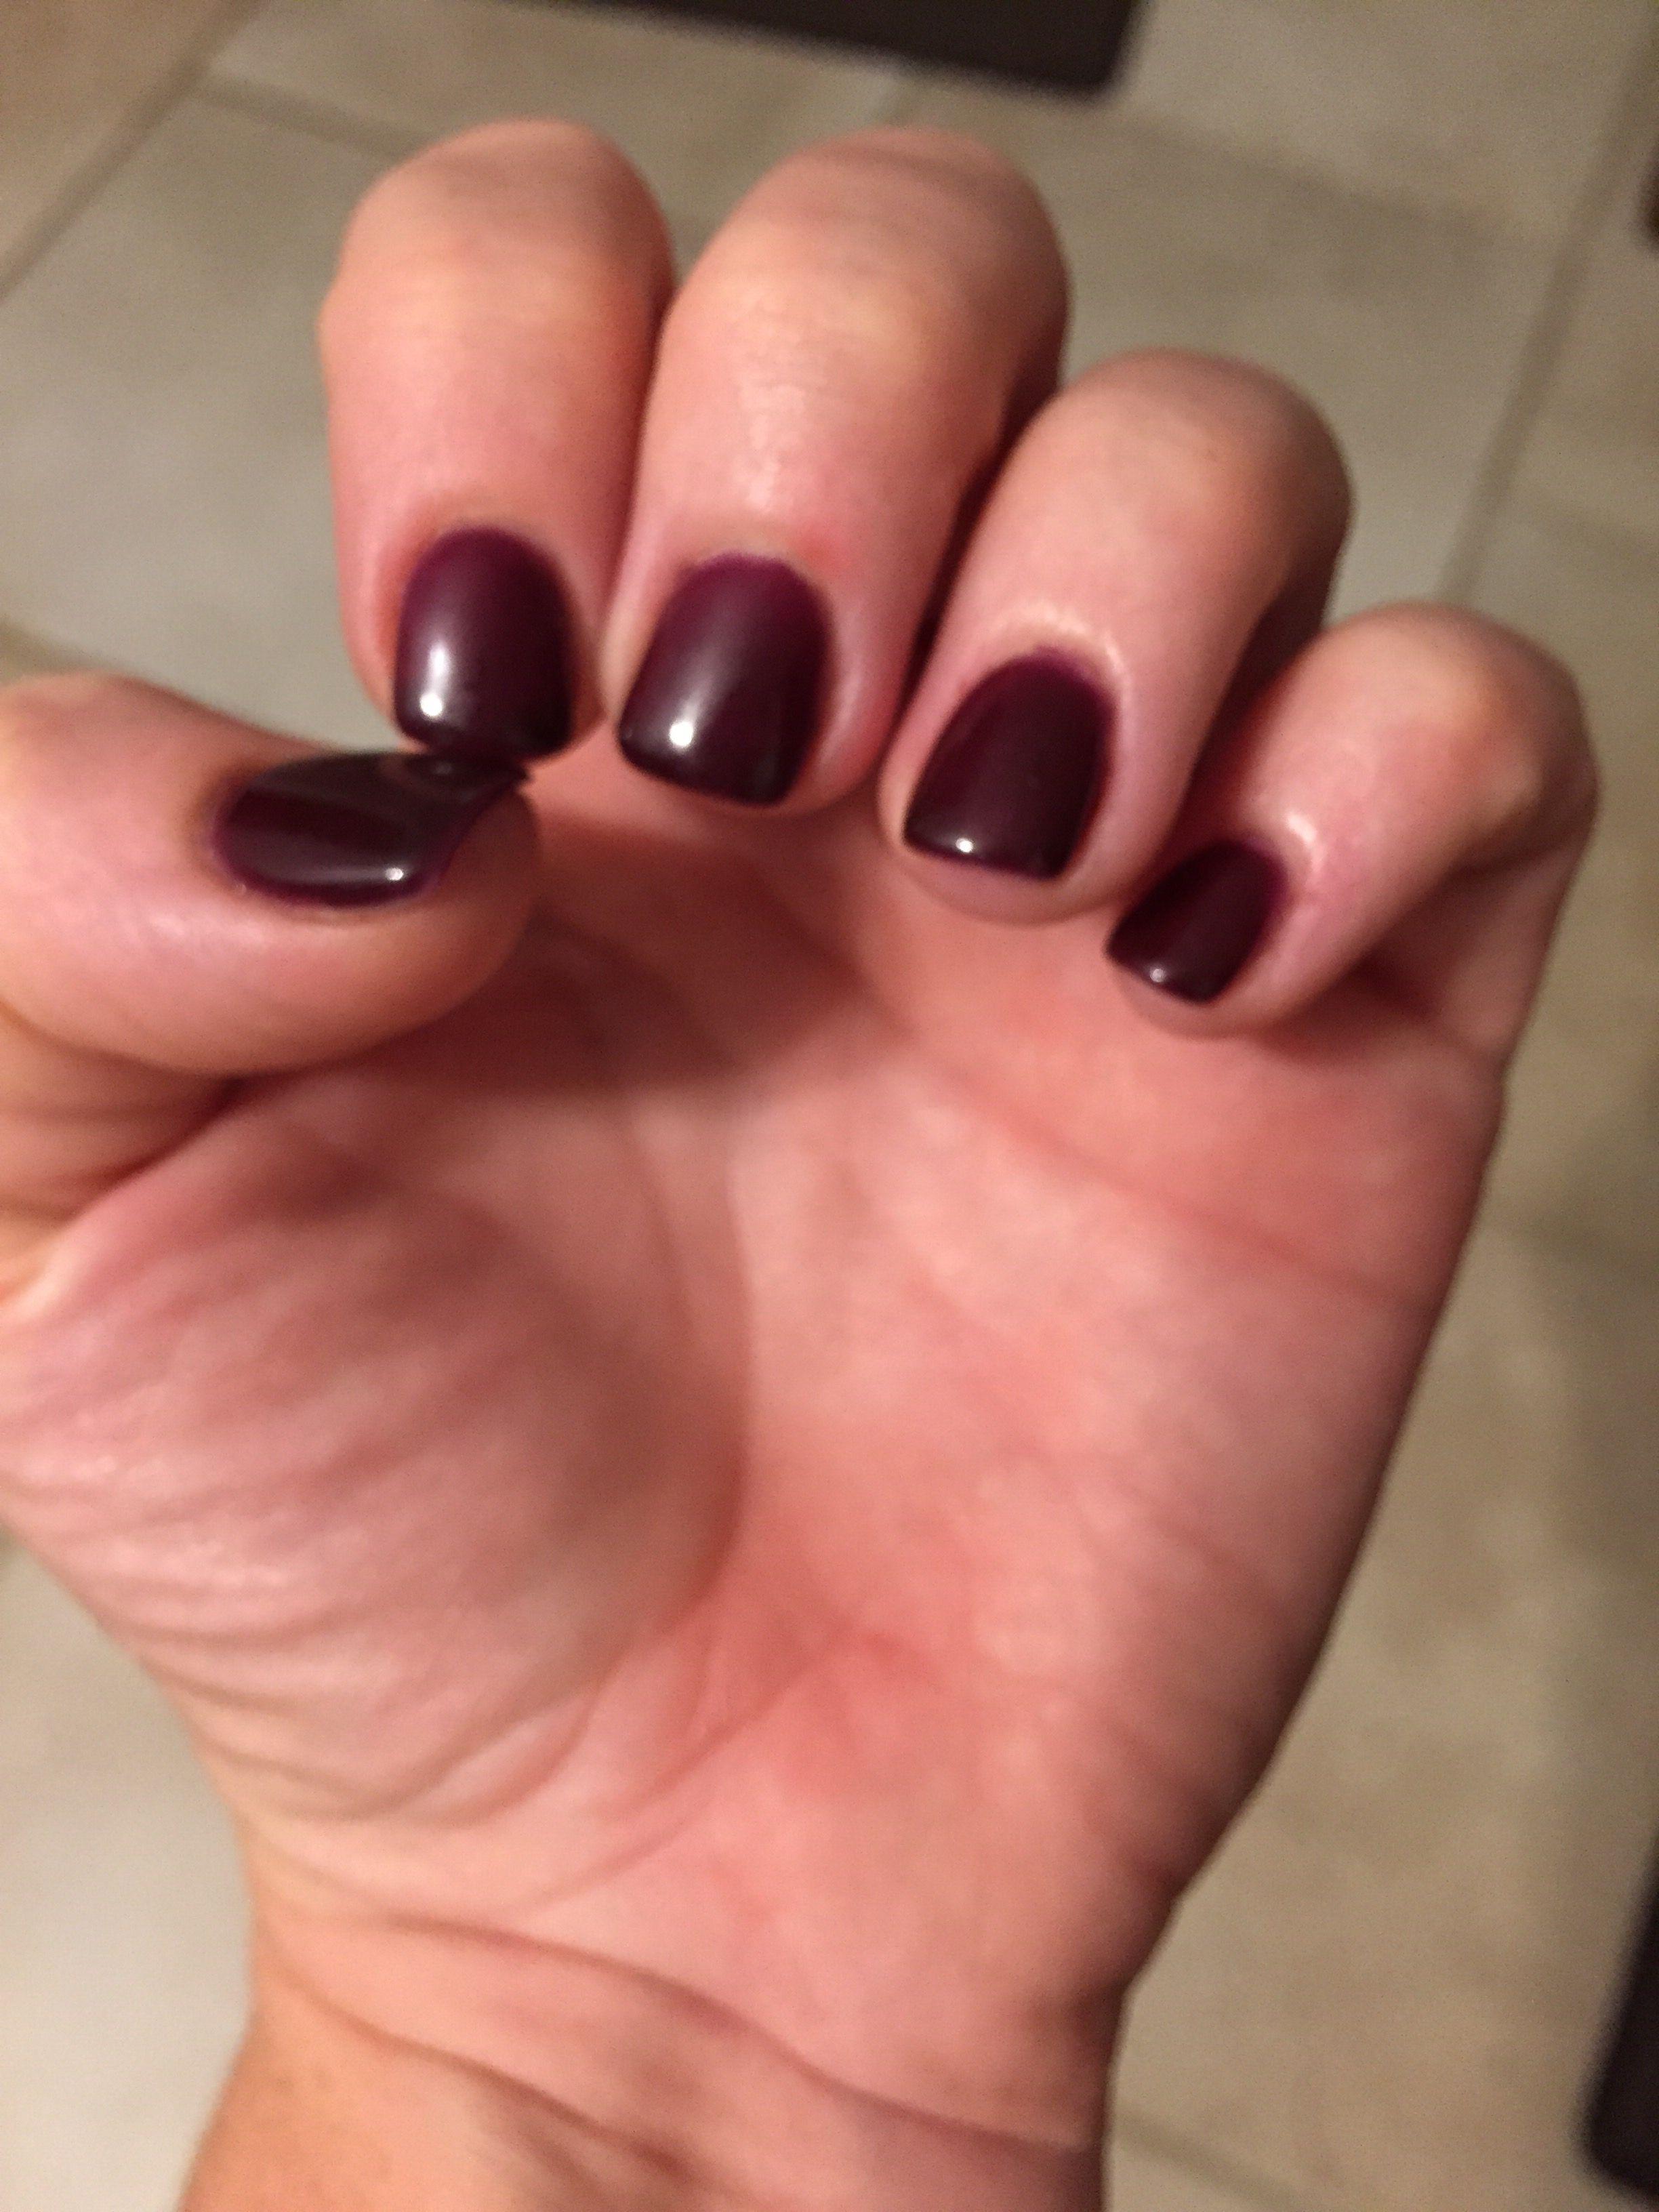 OPI gel color Vampsterdam - kinda like a red wine color. Love it ...